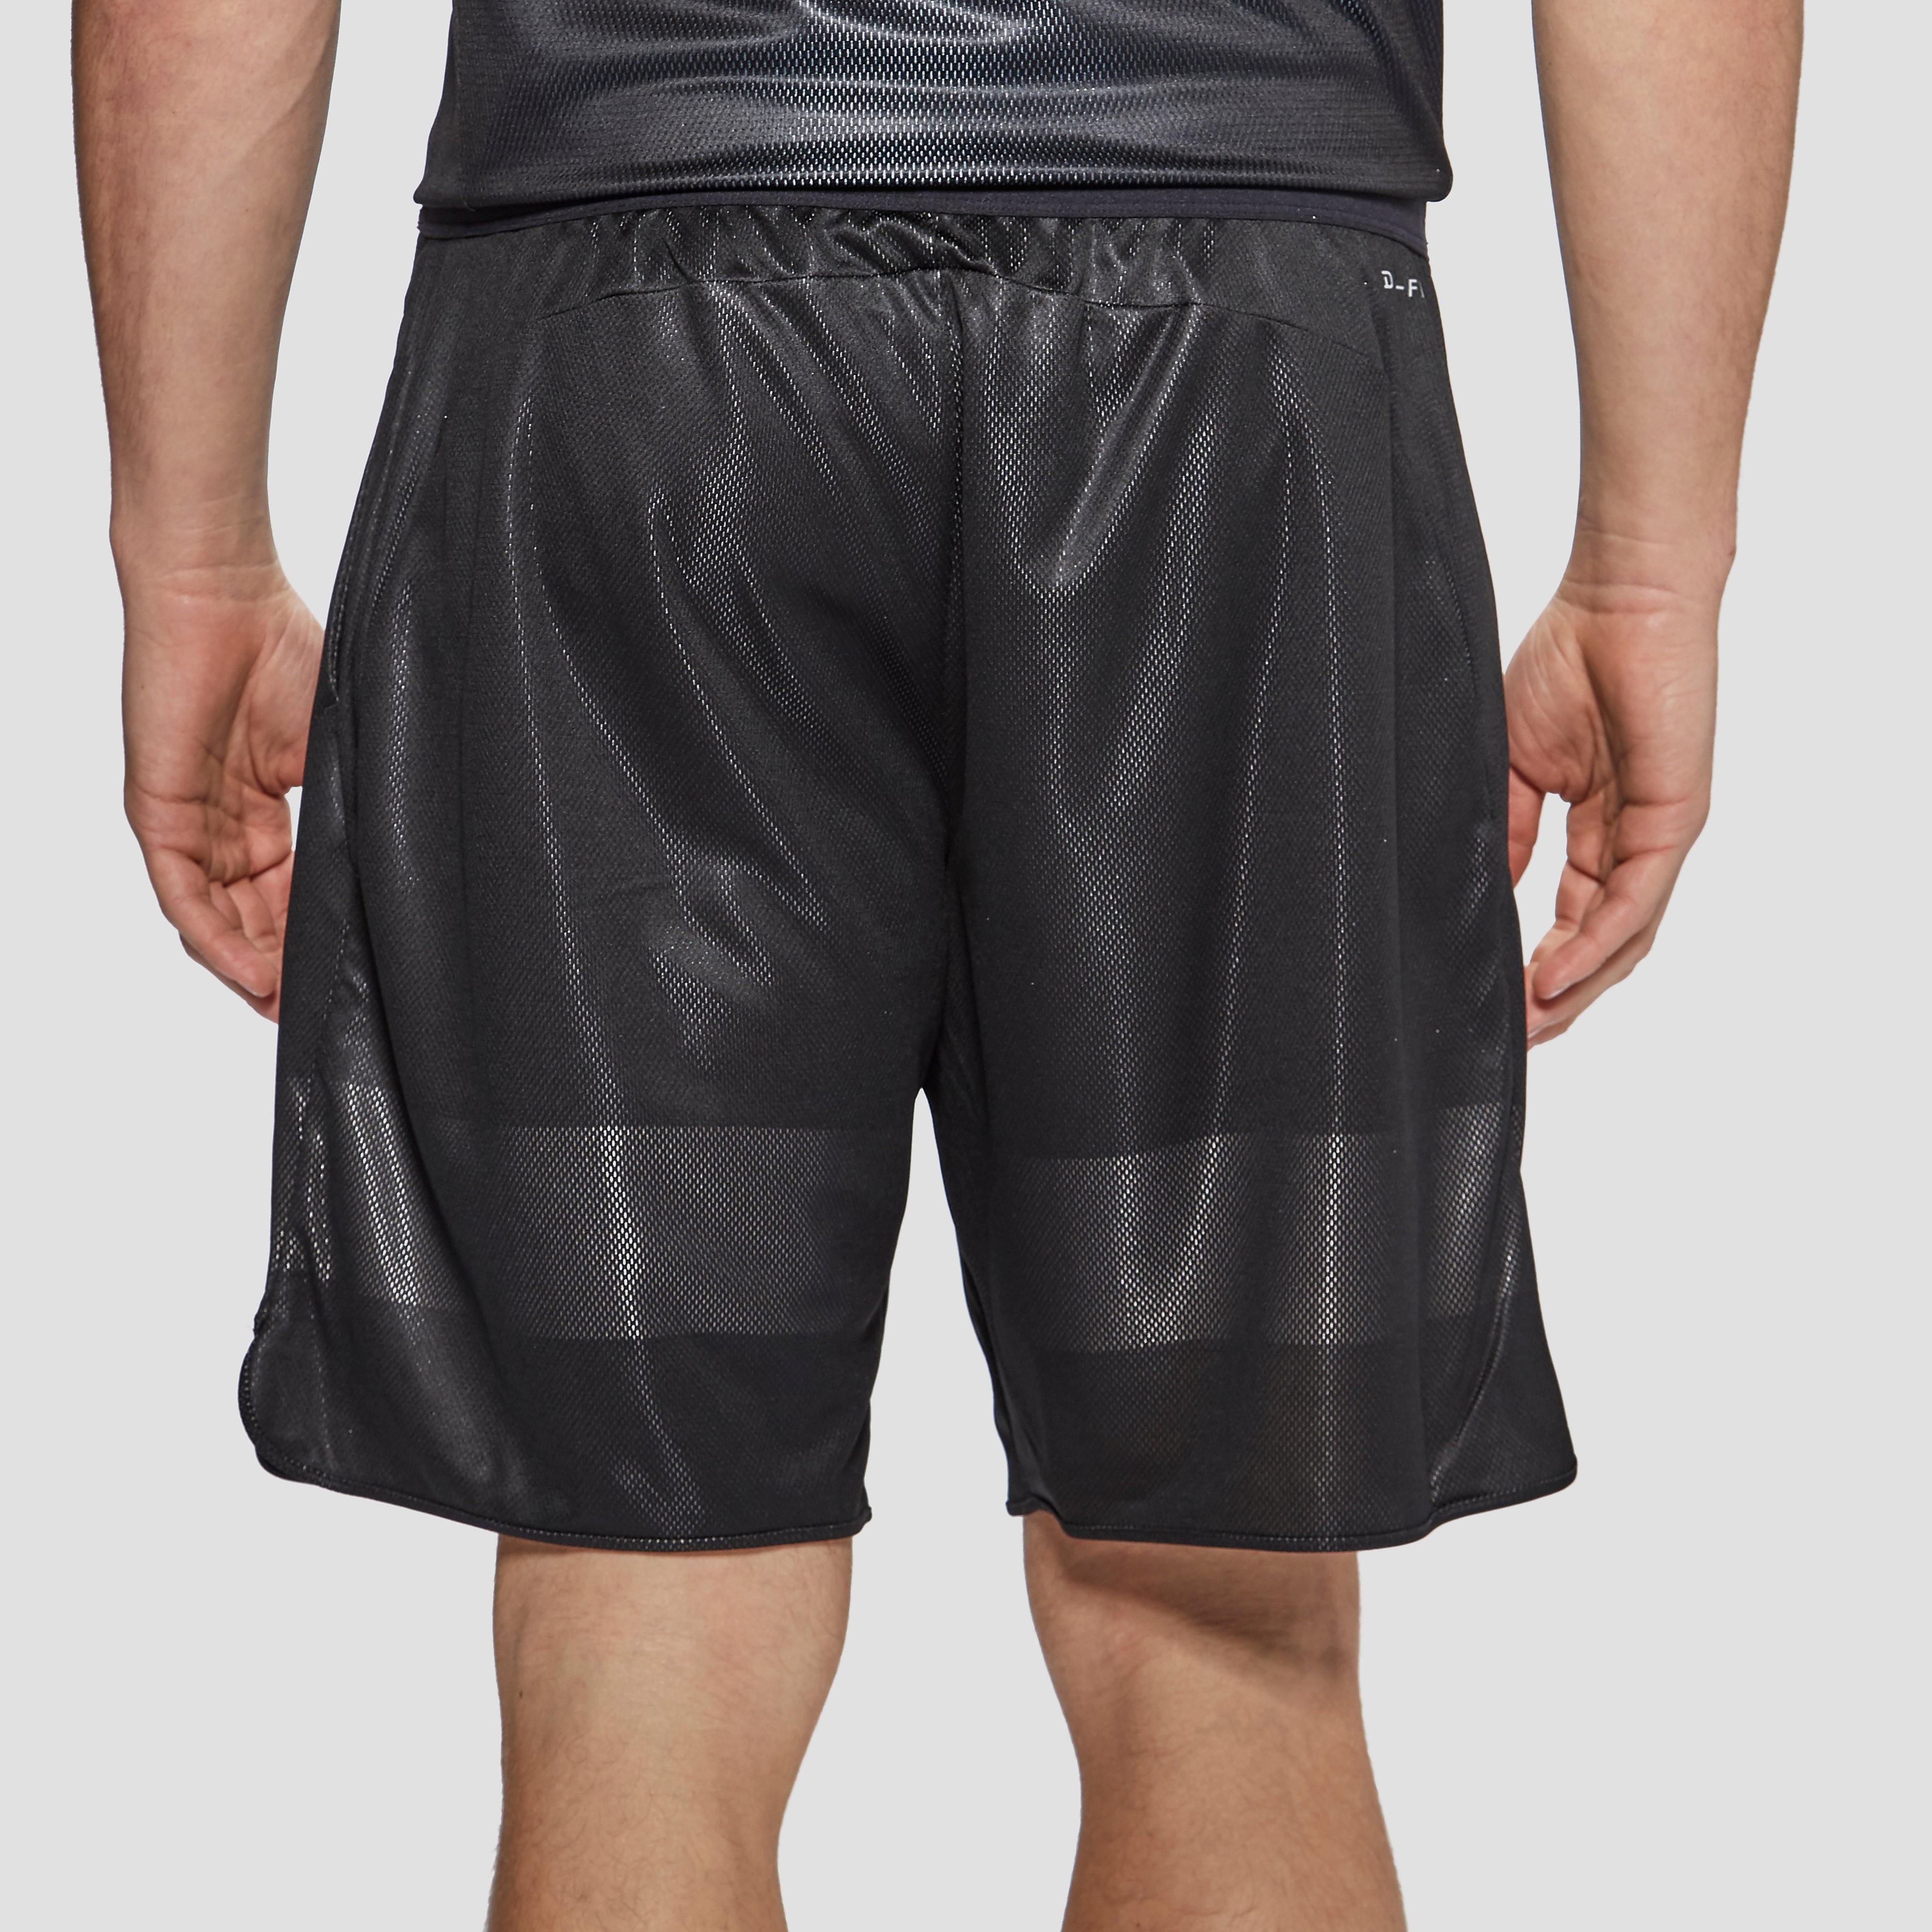 Nike Ace Men's Tennis Shorts